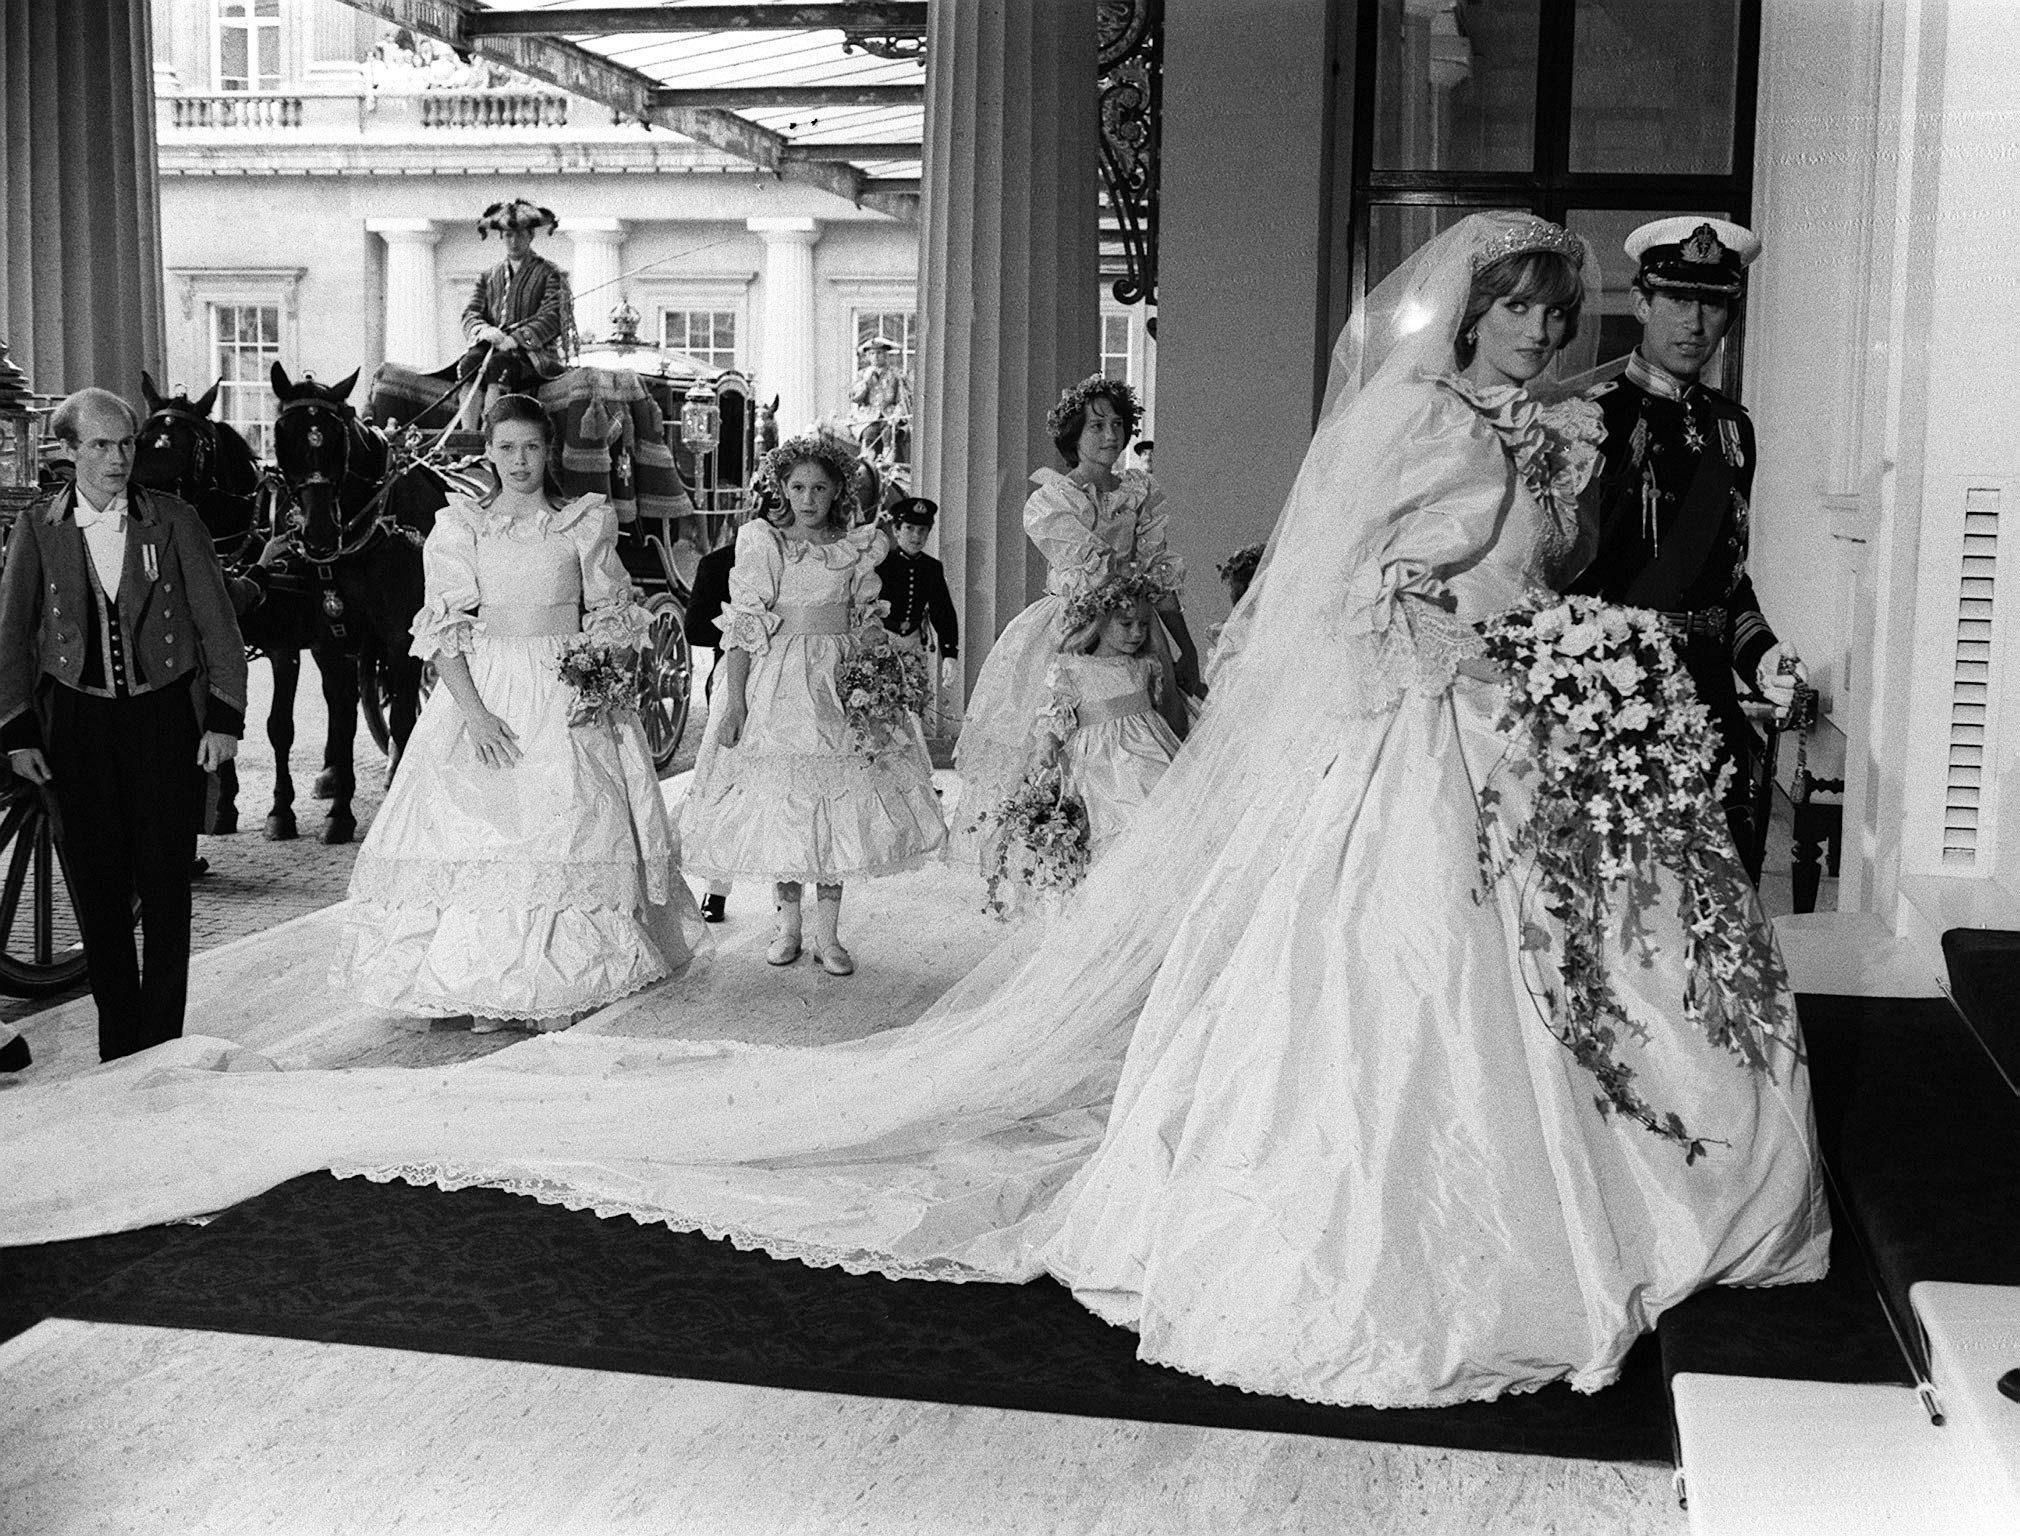 Princess Diana S 1981 Wedding Gown To Go On Display At Kensington Palace This Summer Etcanada Com [ jpg ]